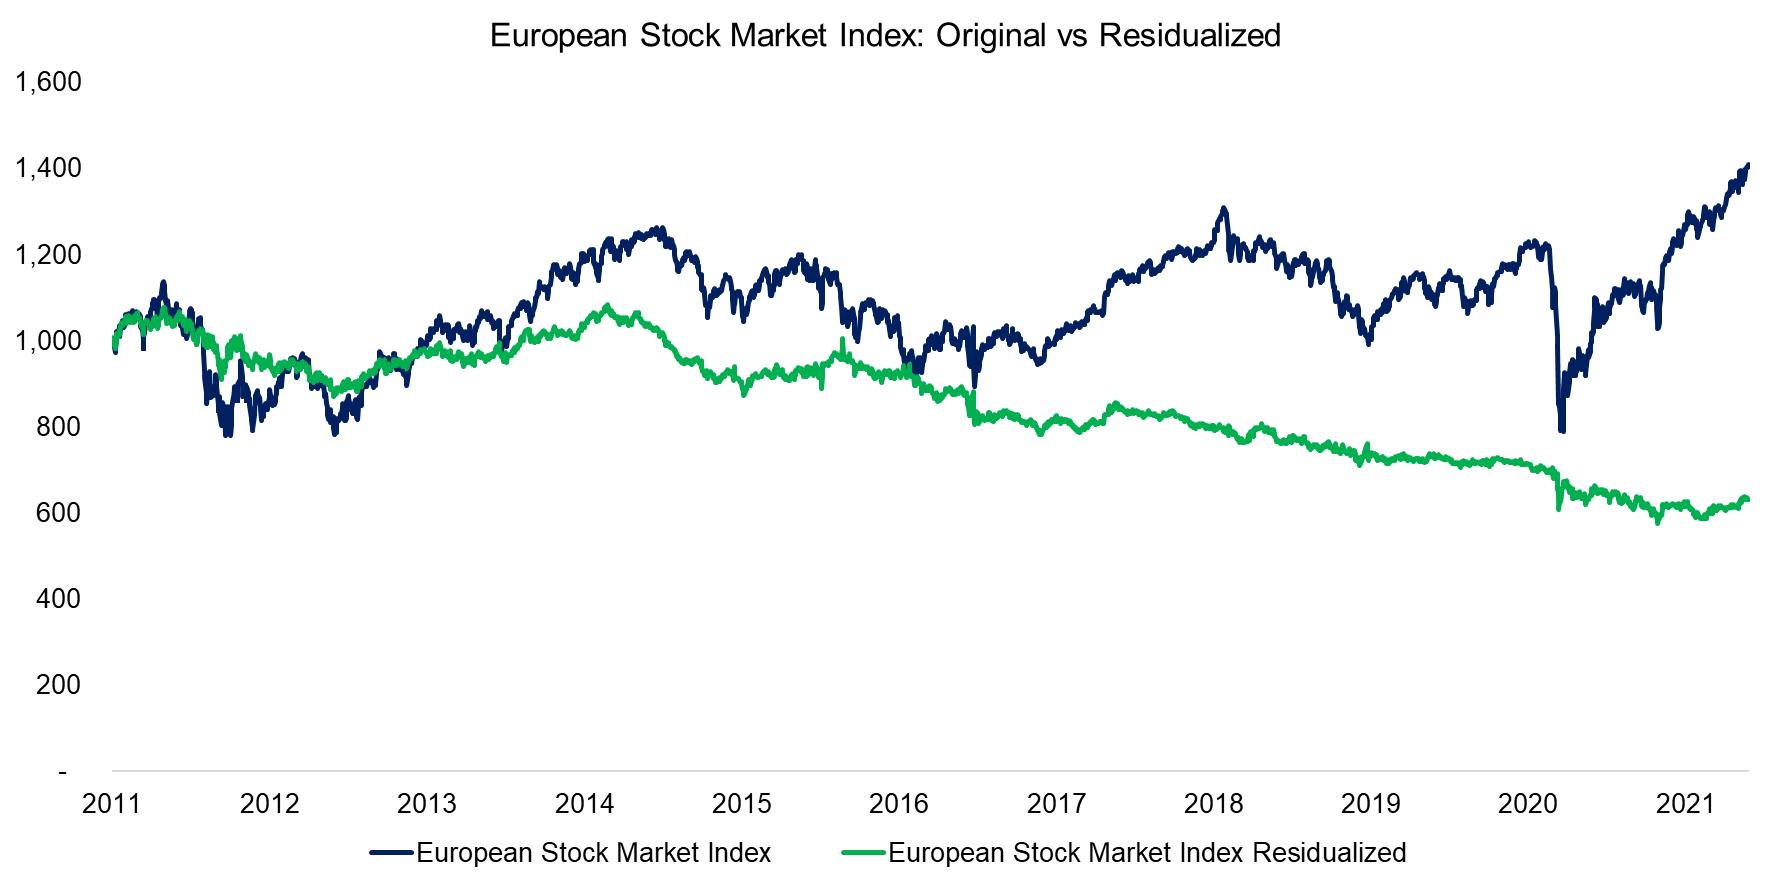 European Stock Market Index Original vs Residualized